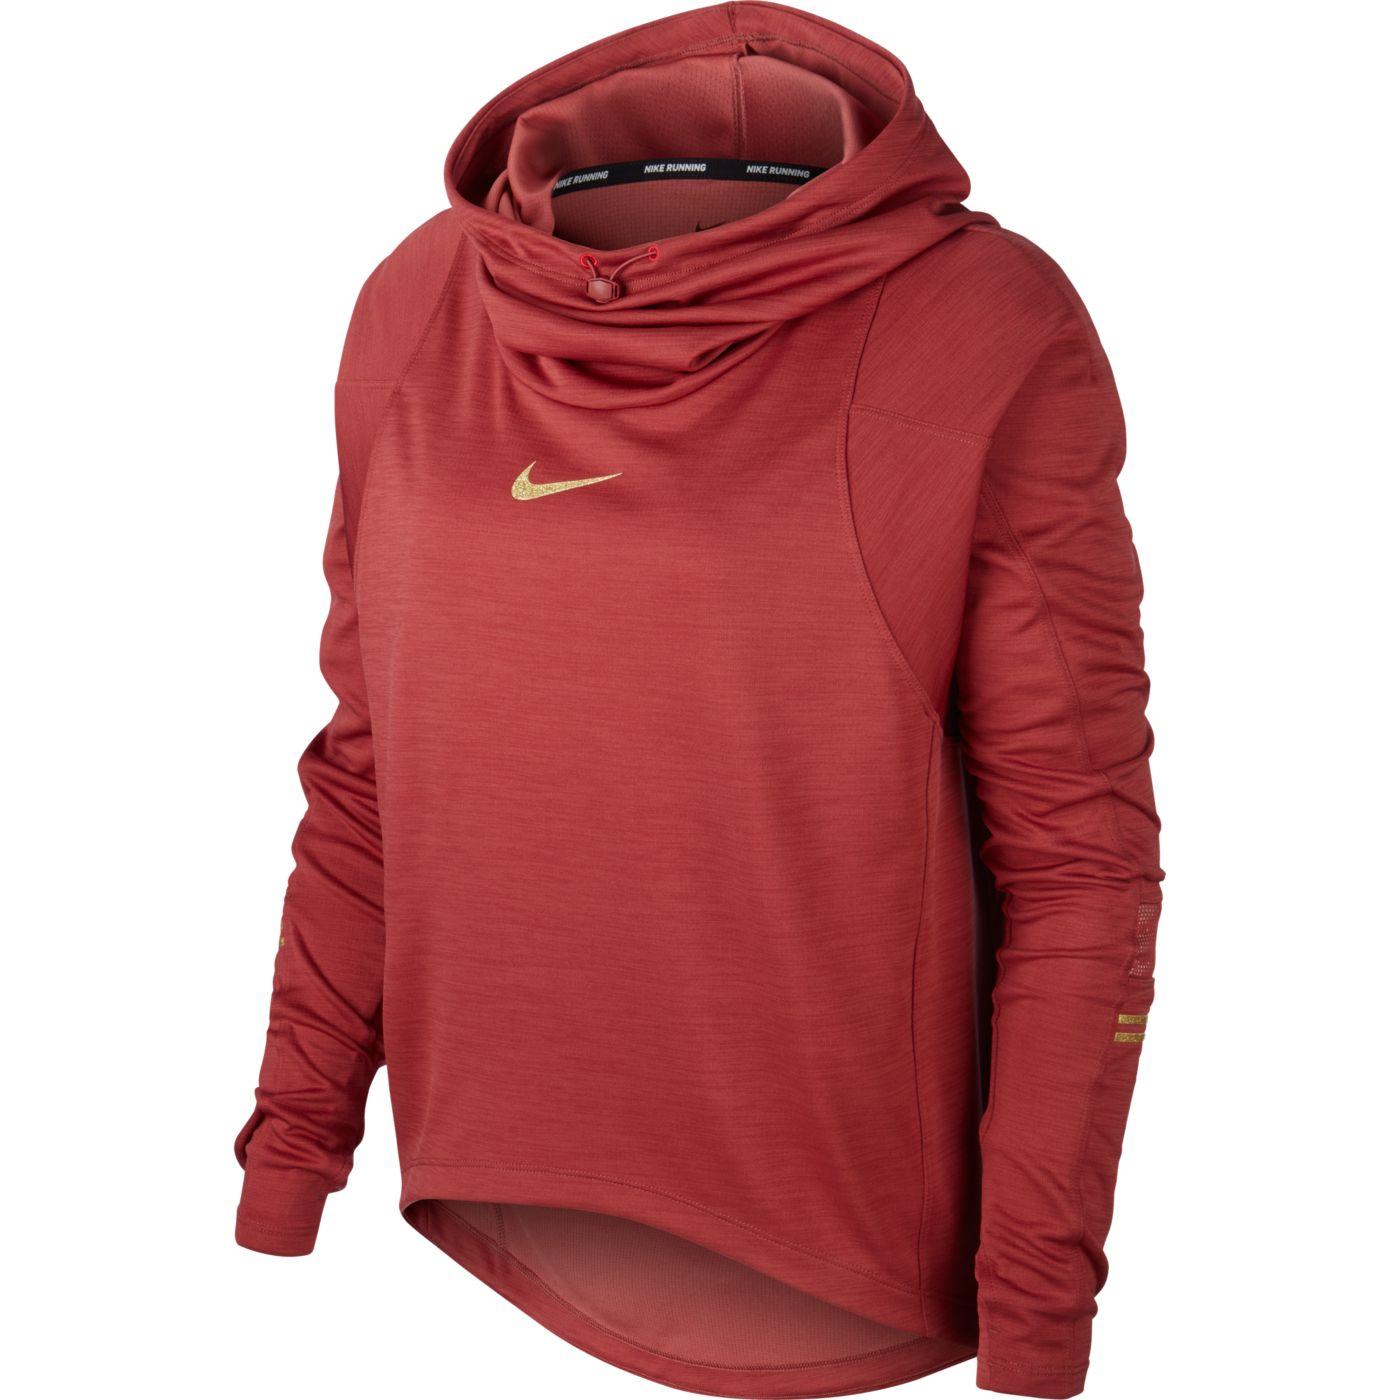 Nike Women's Glam Dunk Running Long Sleeve Shirt